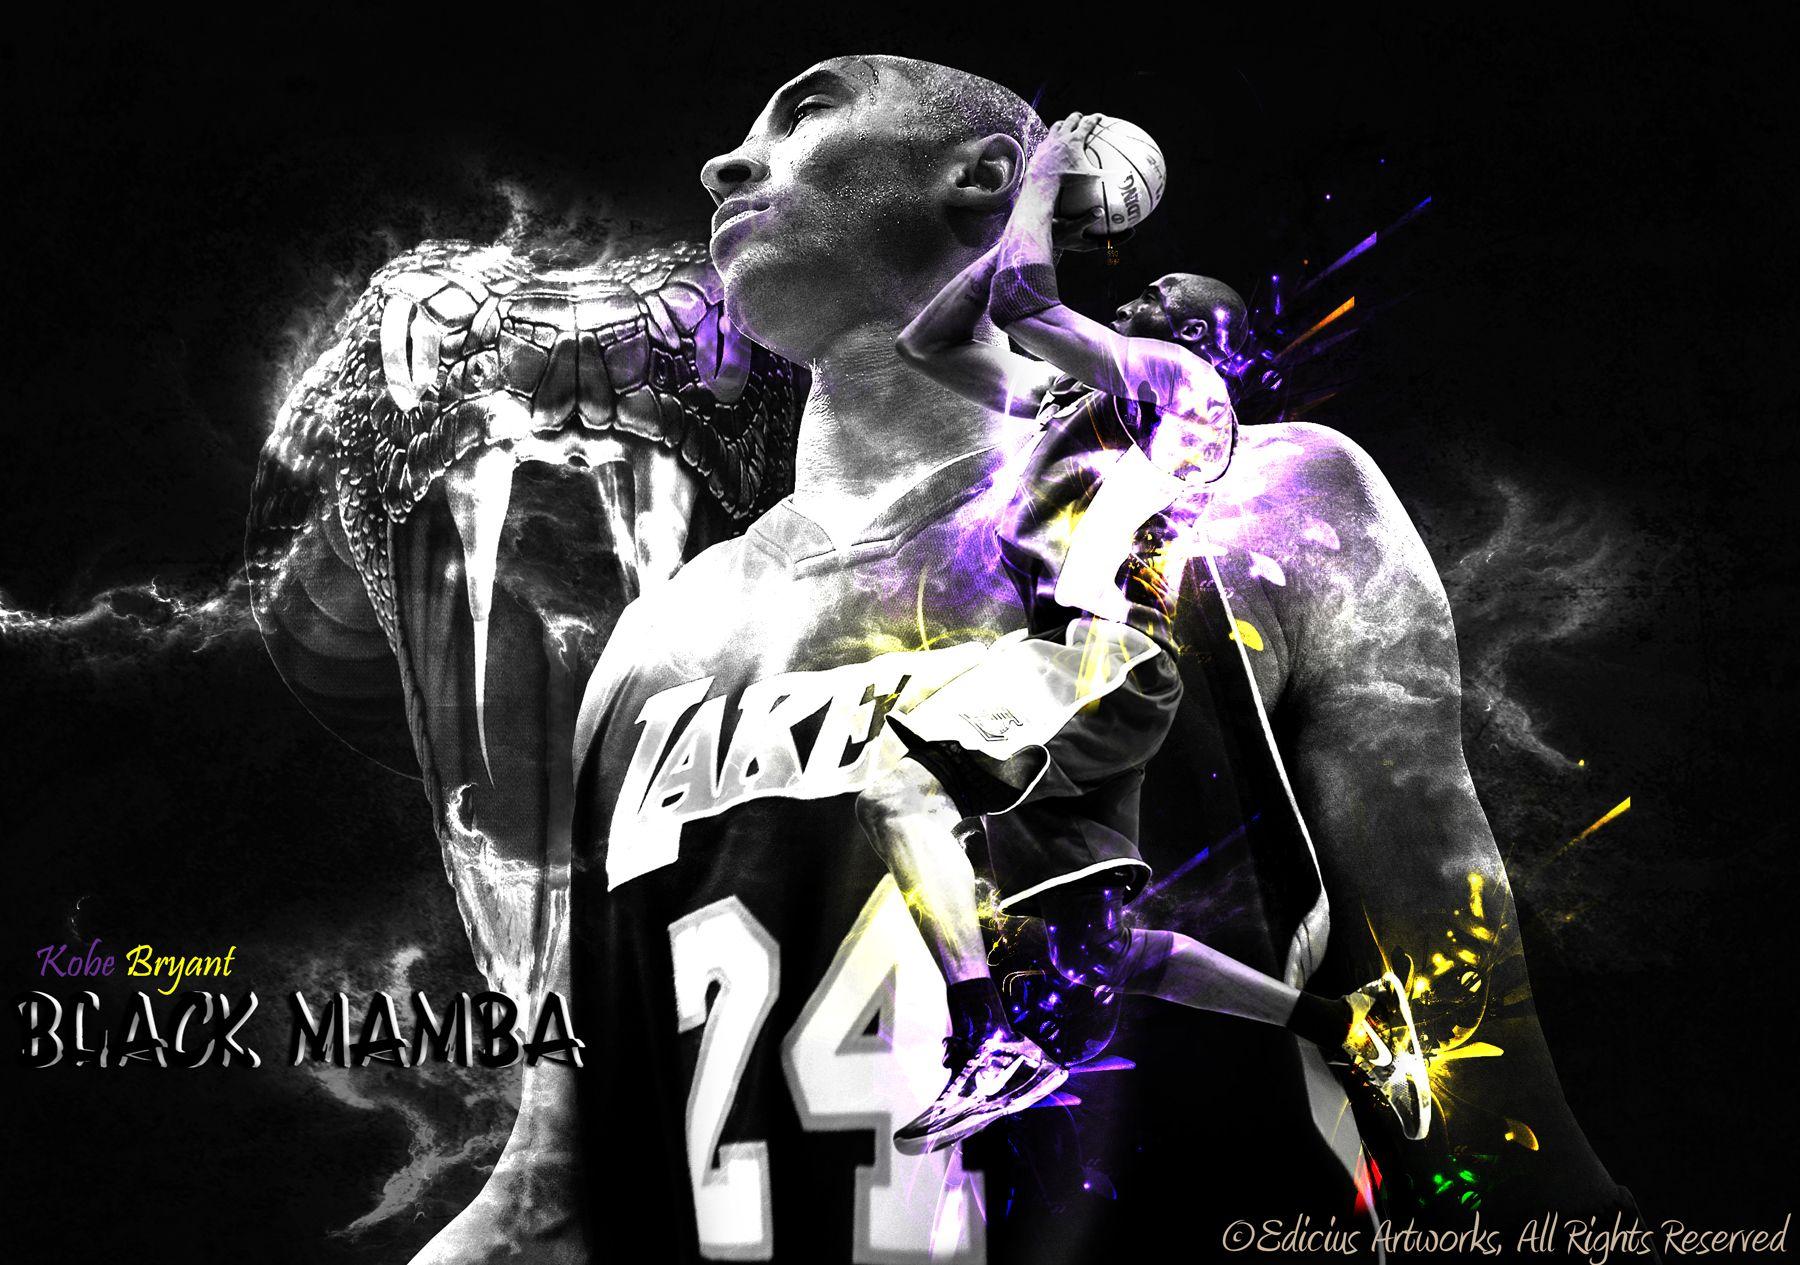 Kobe Bryant Black Mamba This Is By Far The Best Wallpaper I Have Done Kobe Bryant Black Mamba Kobe Bryant Wallpaper Kobe Bryant Pictures